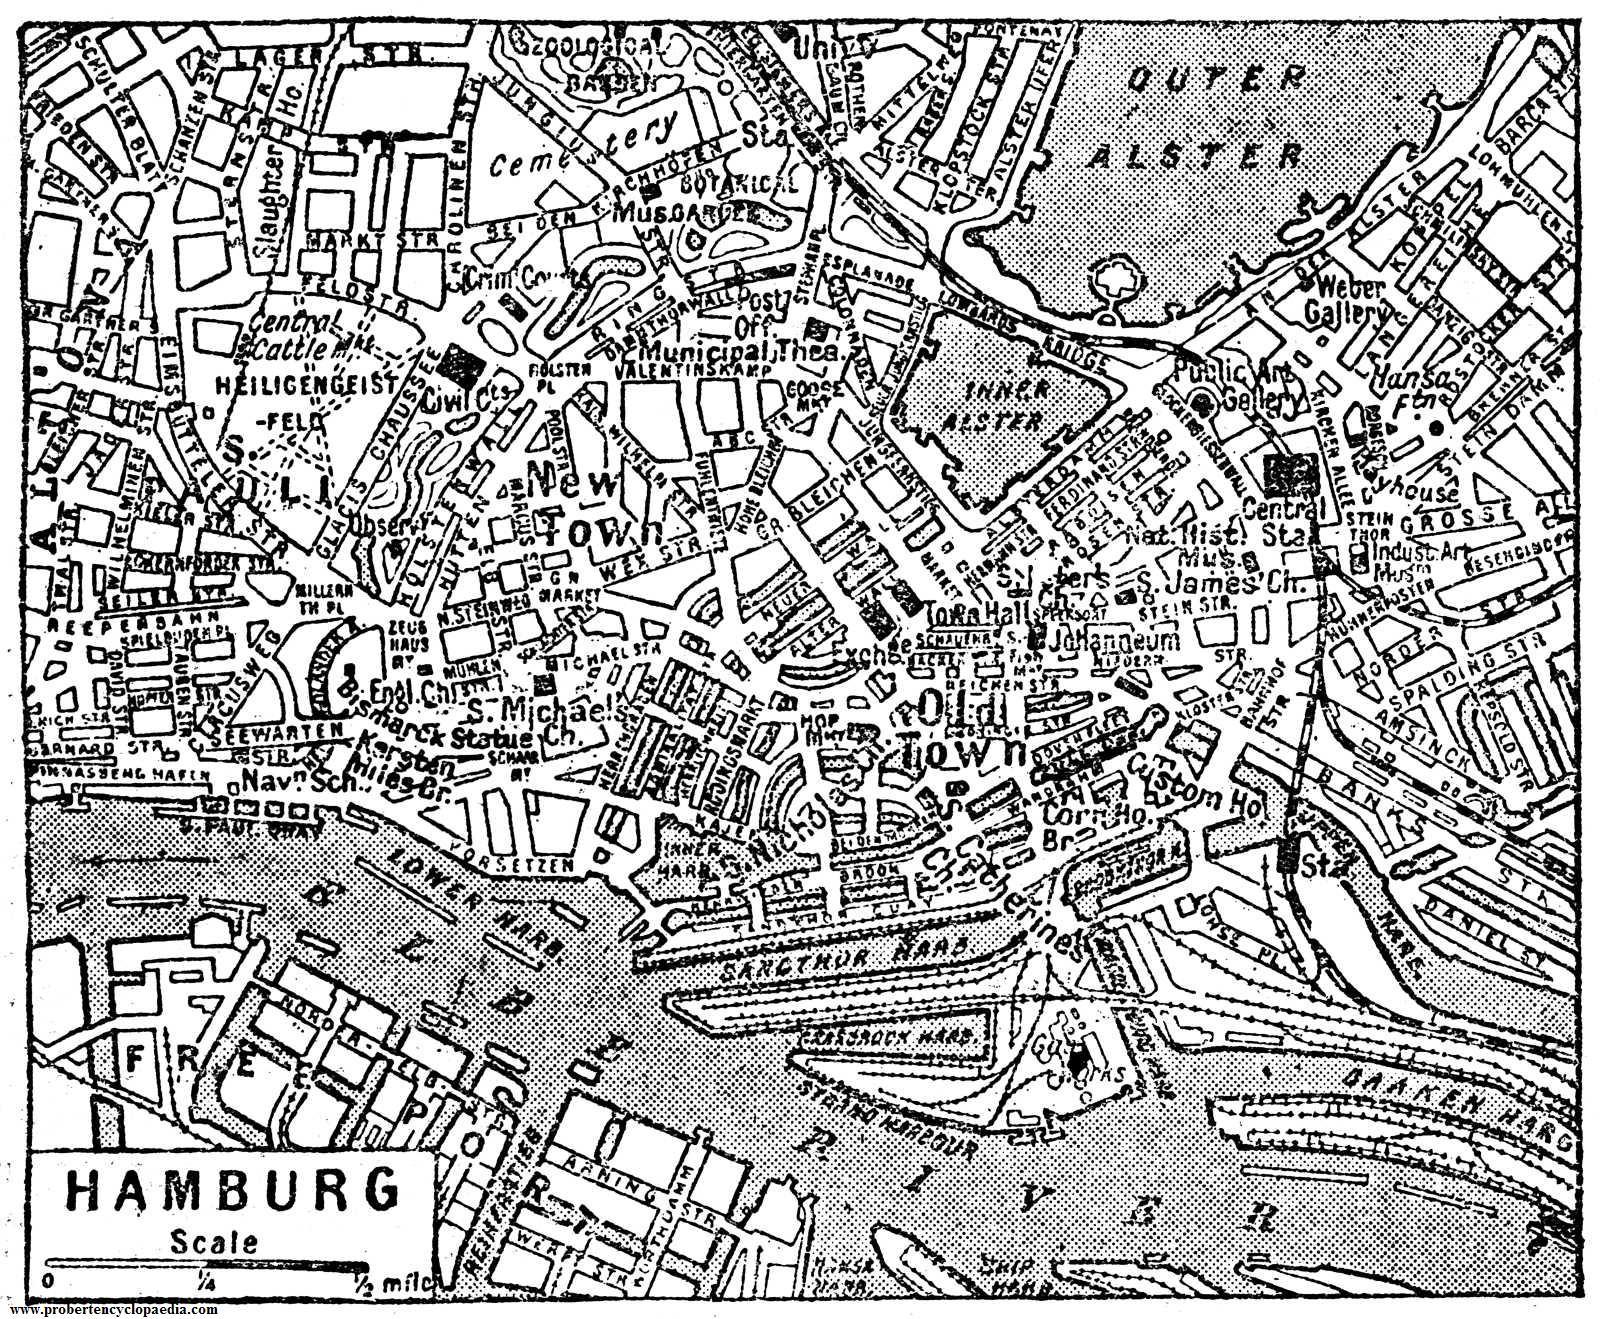 Mapa de Hamburgo 1932